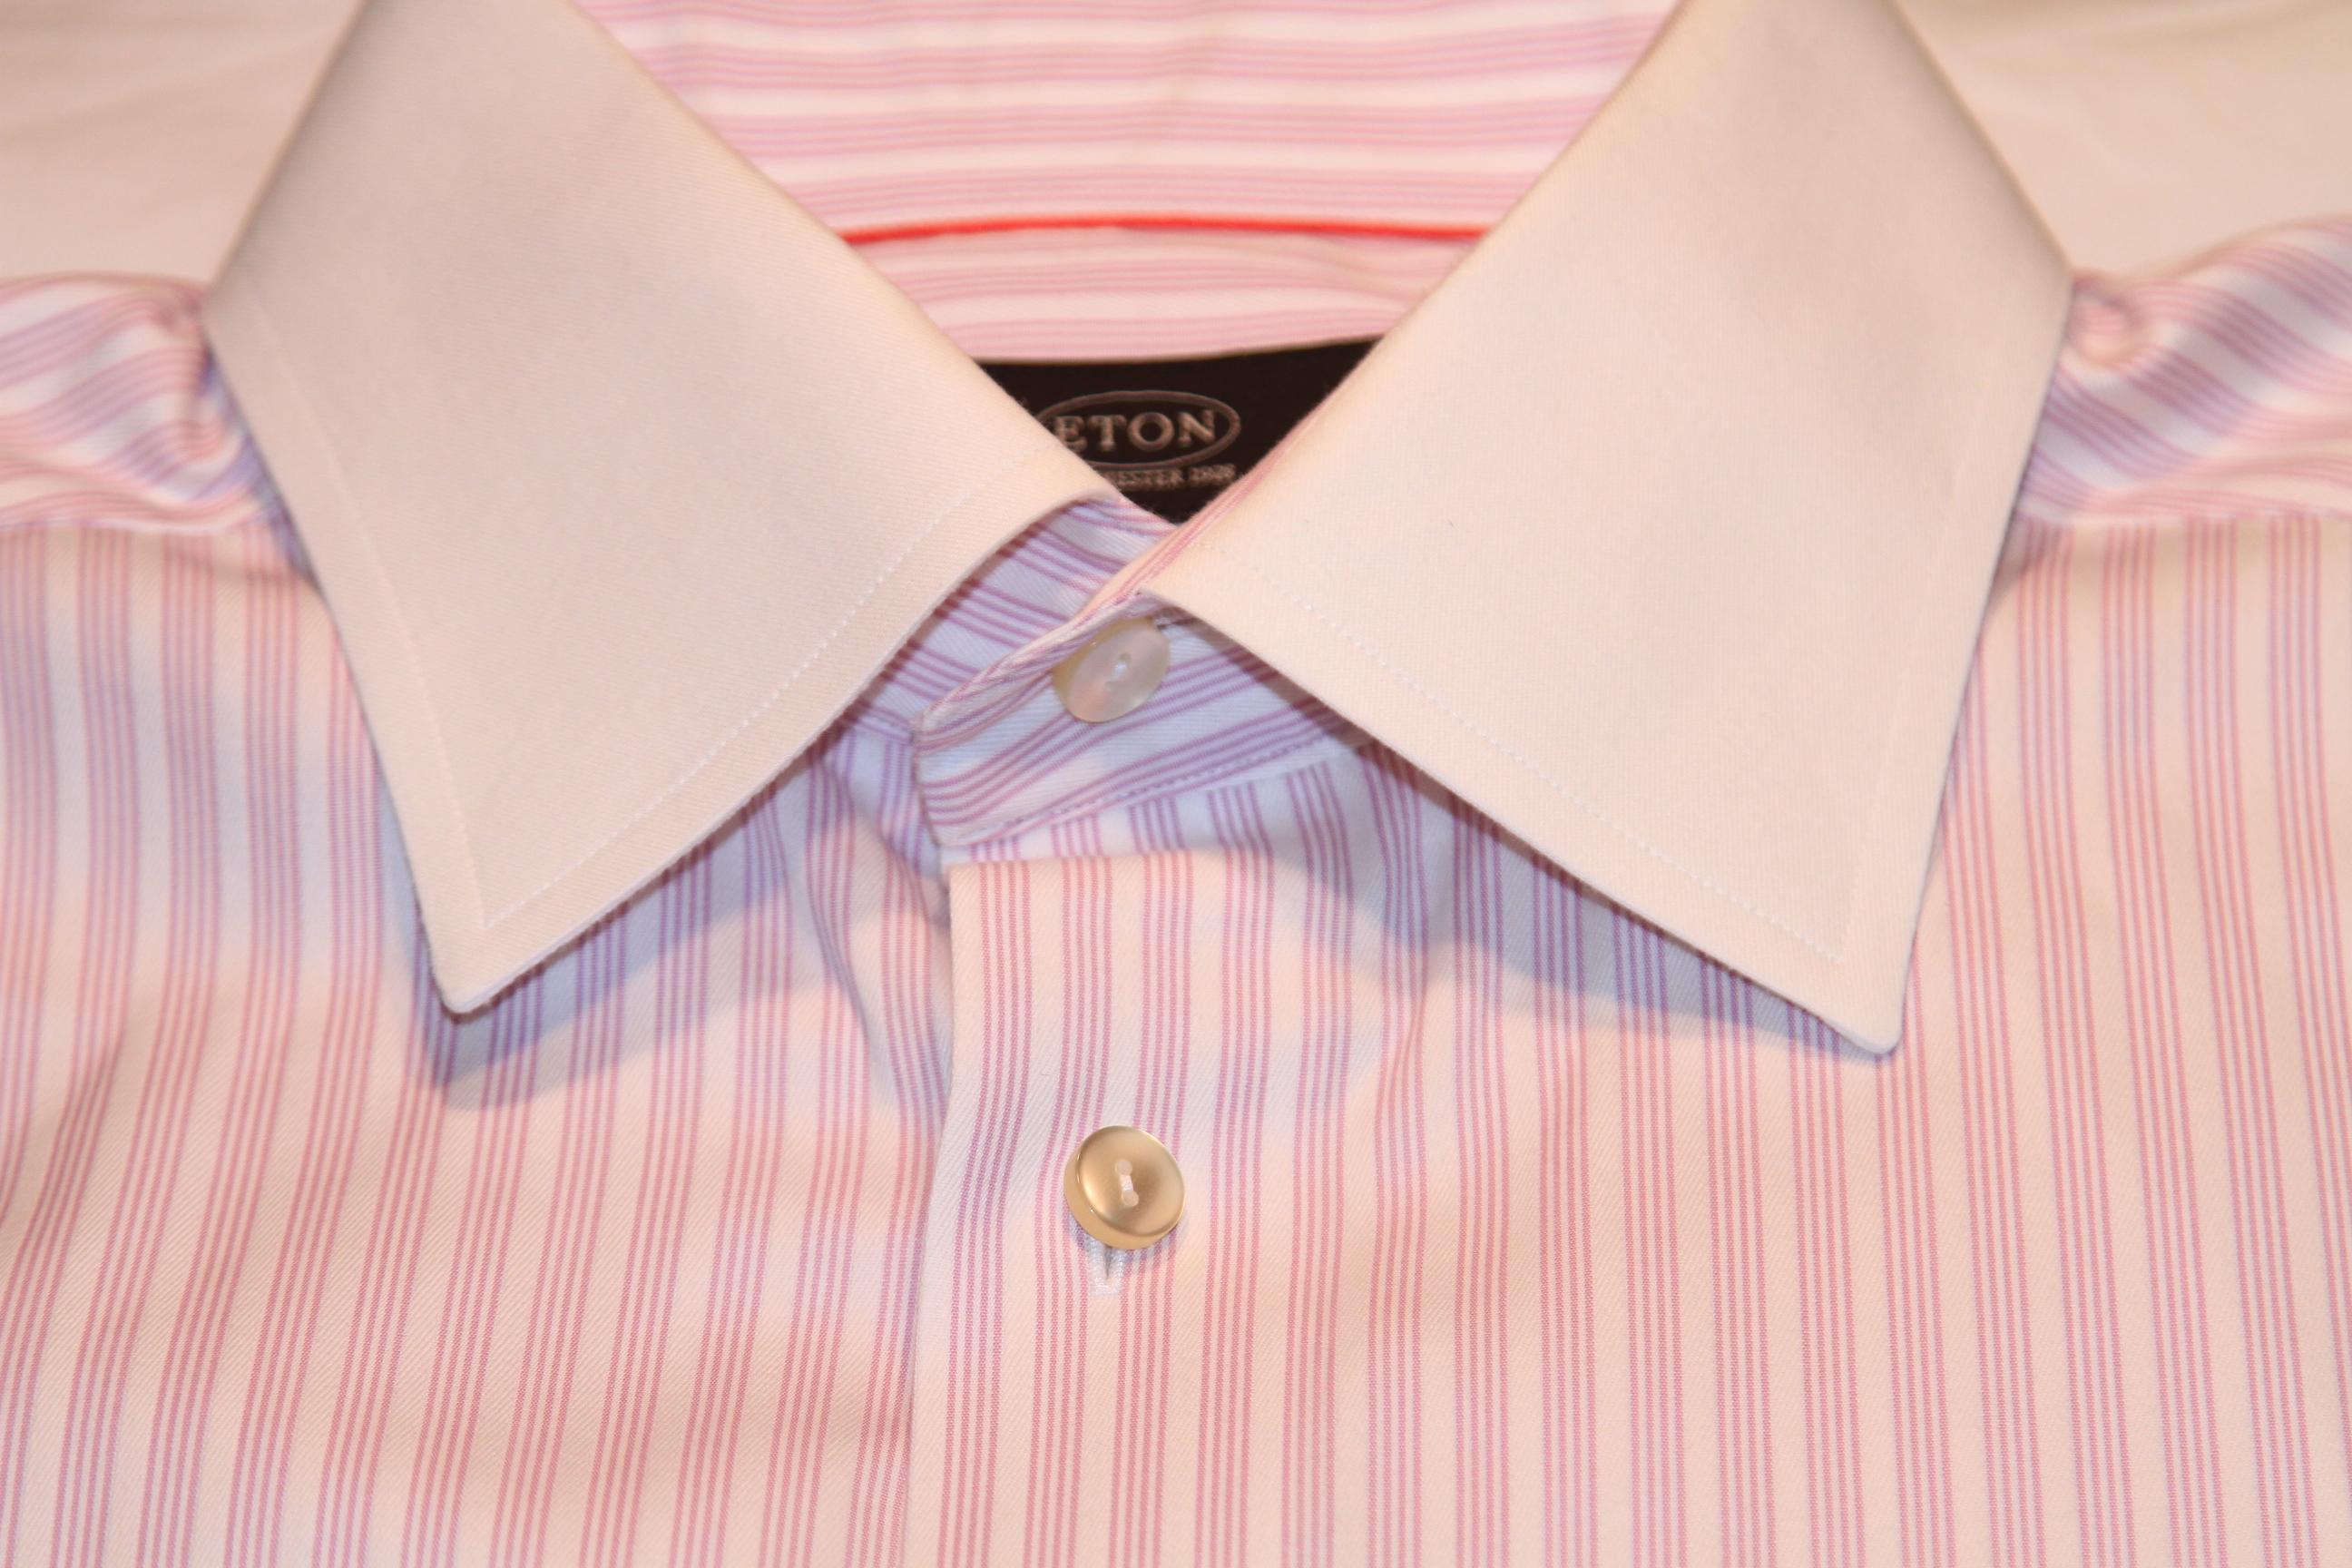 #10 - Eton 41/16 White with Light Magenta quadruple stripe. White collar and cuffs